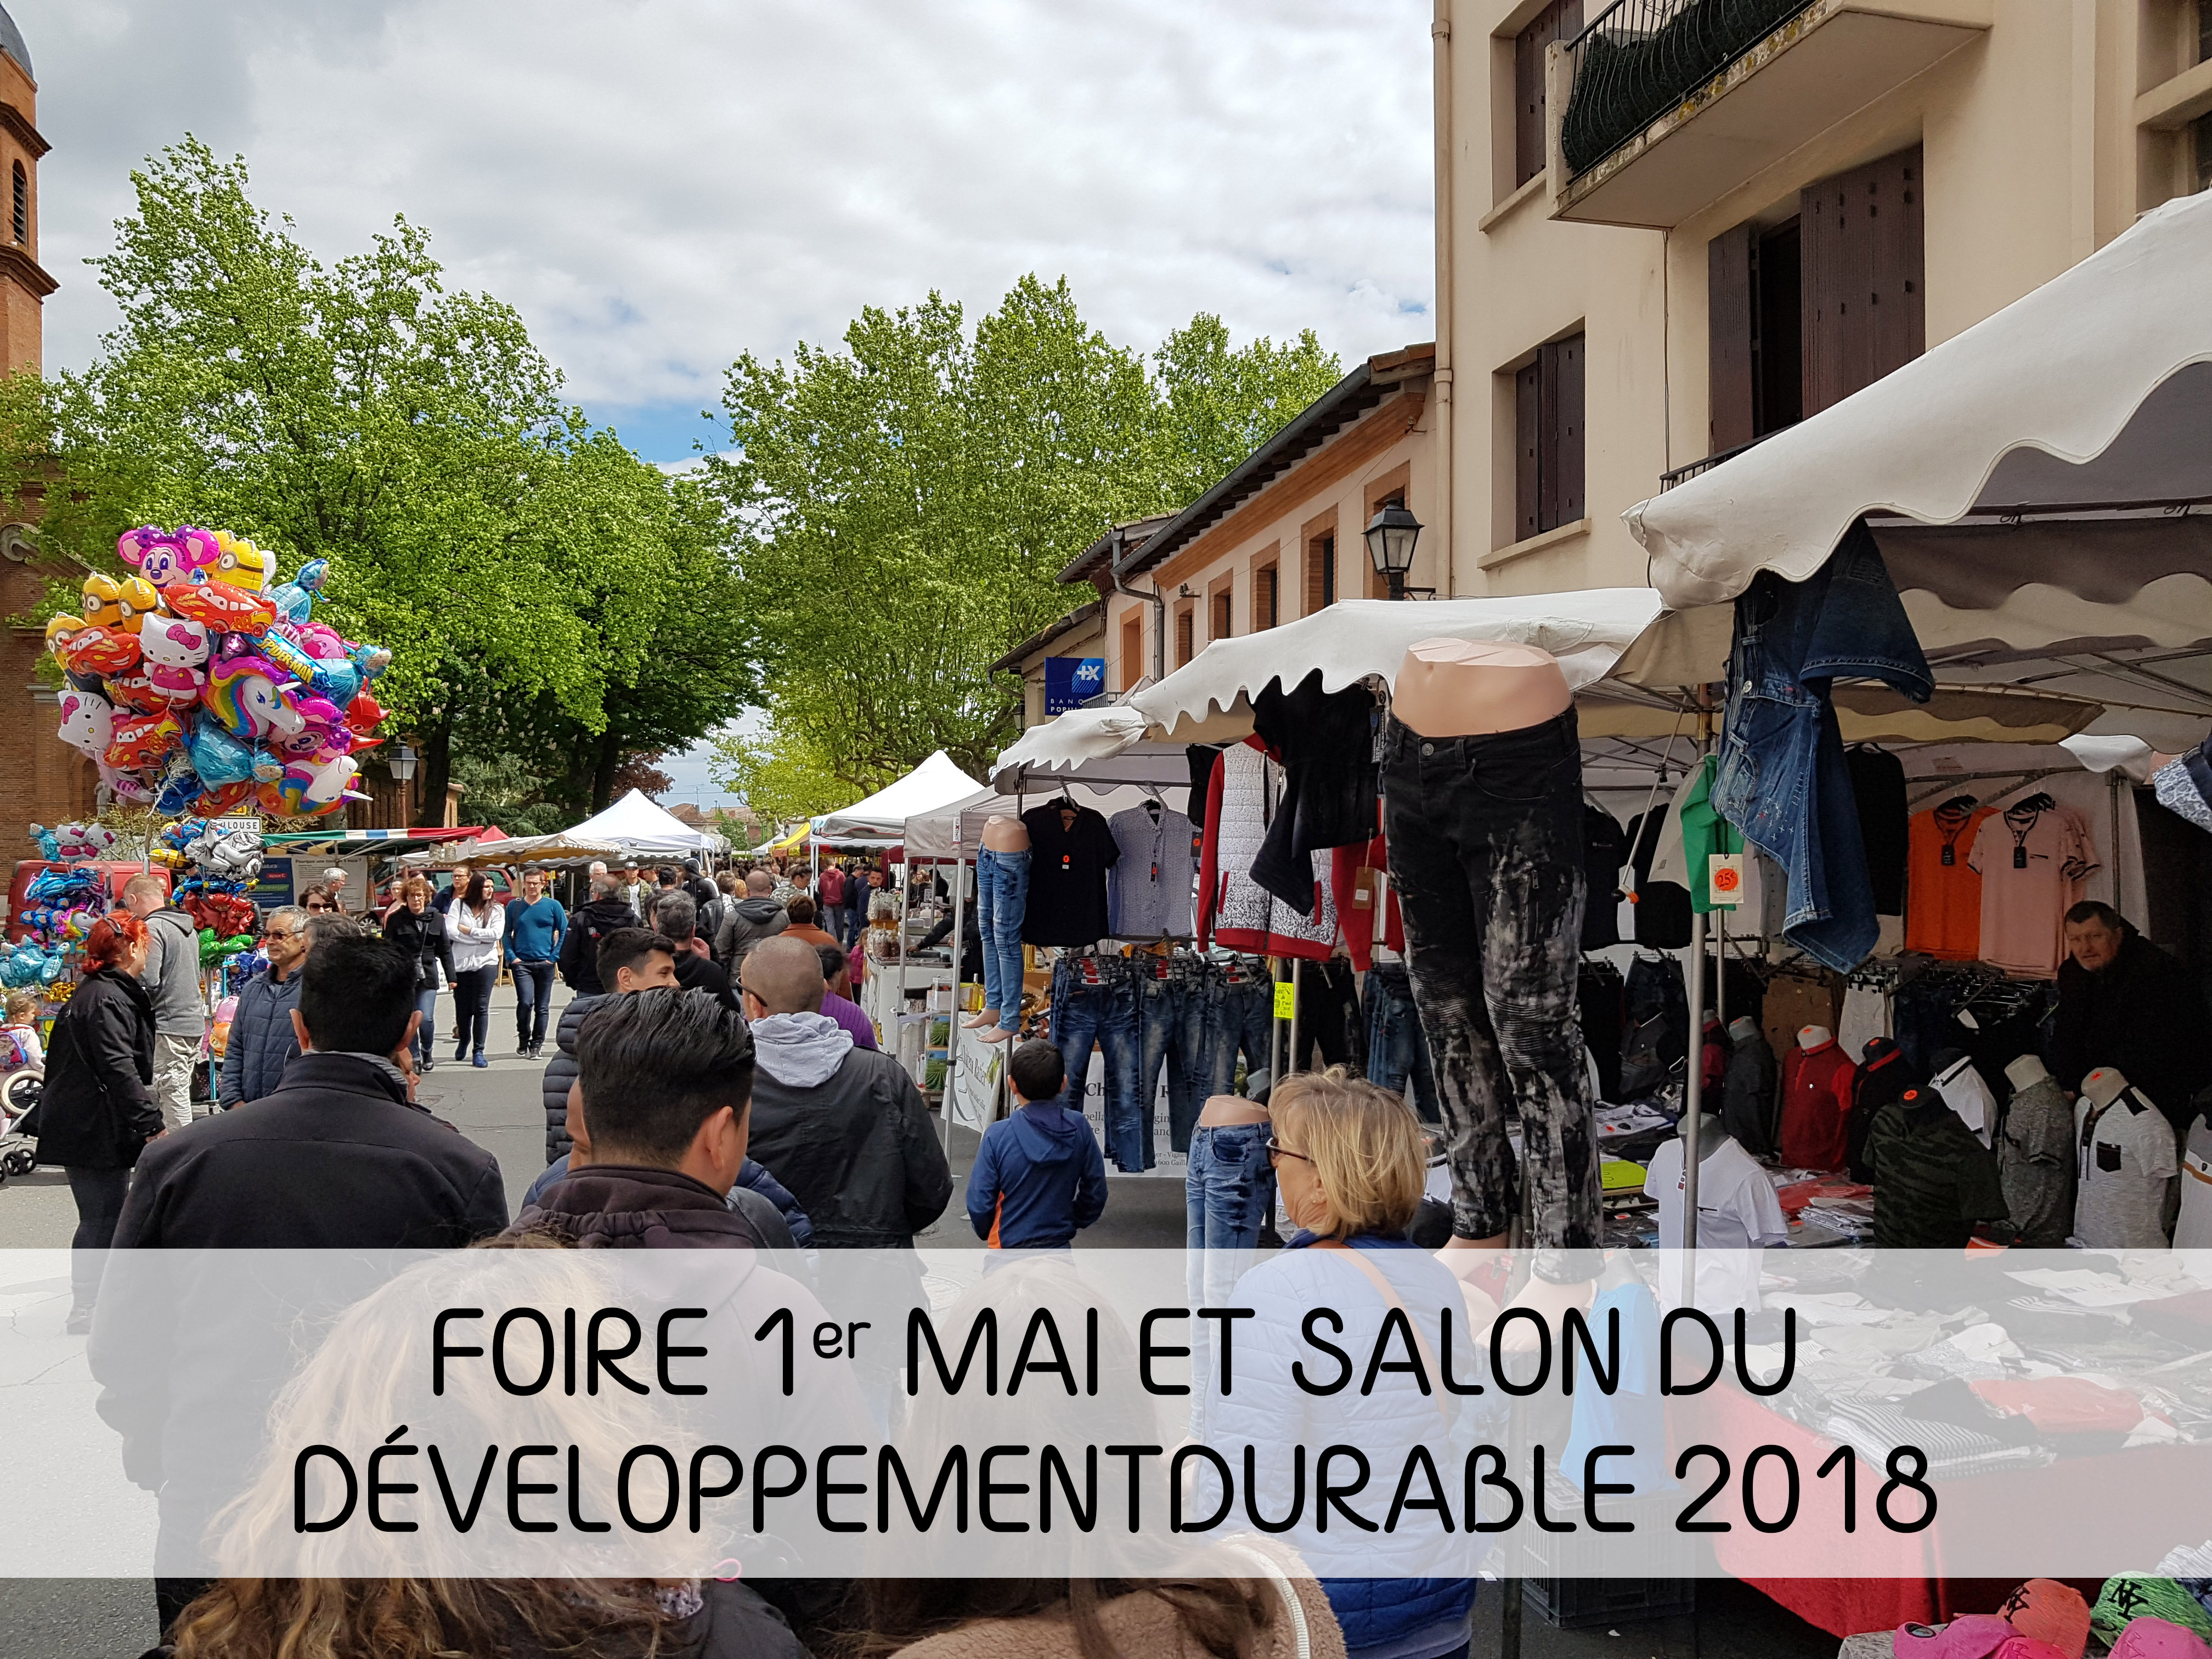 foire-1er-mai-et-salon-dd-2018